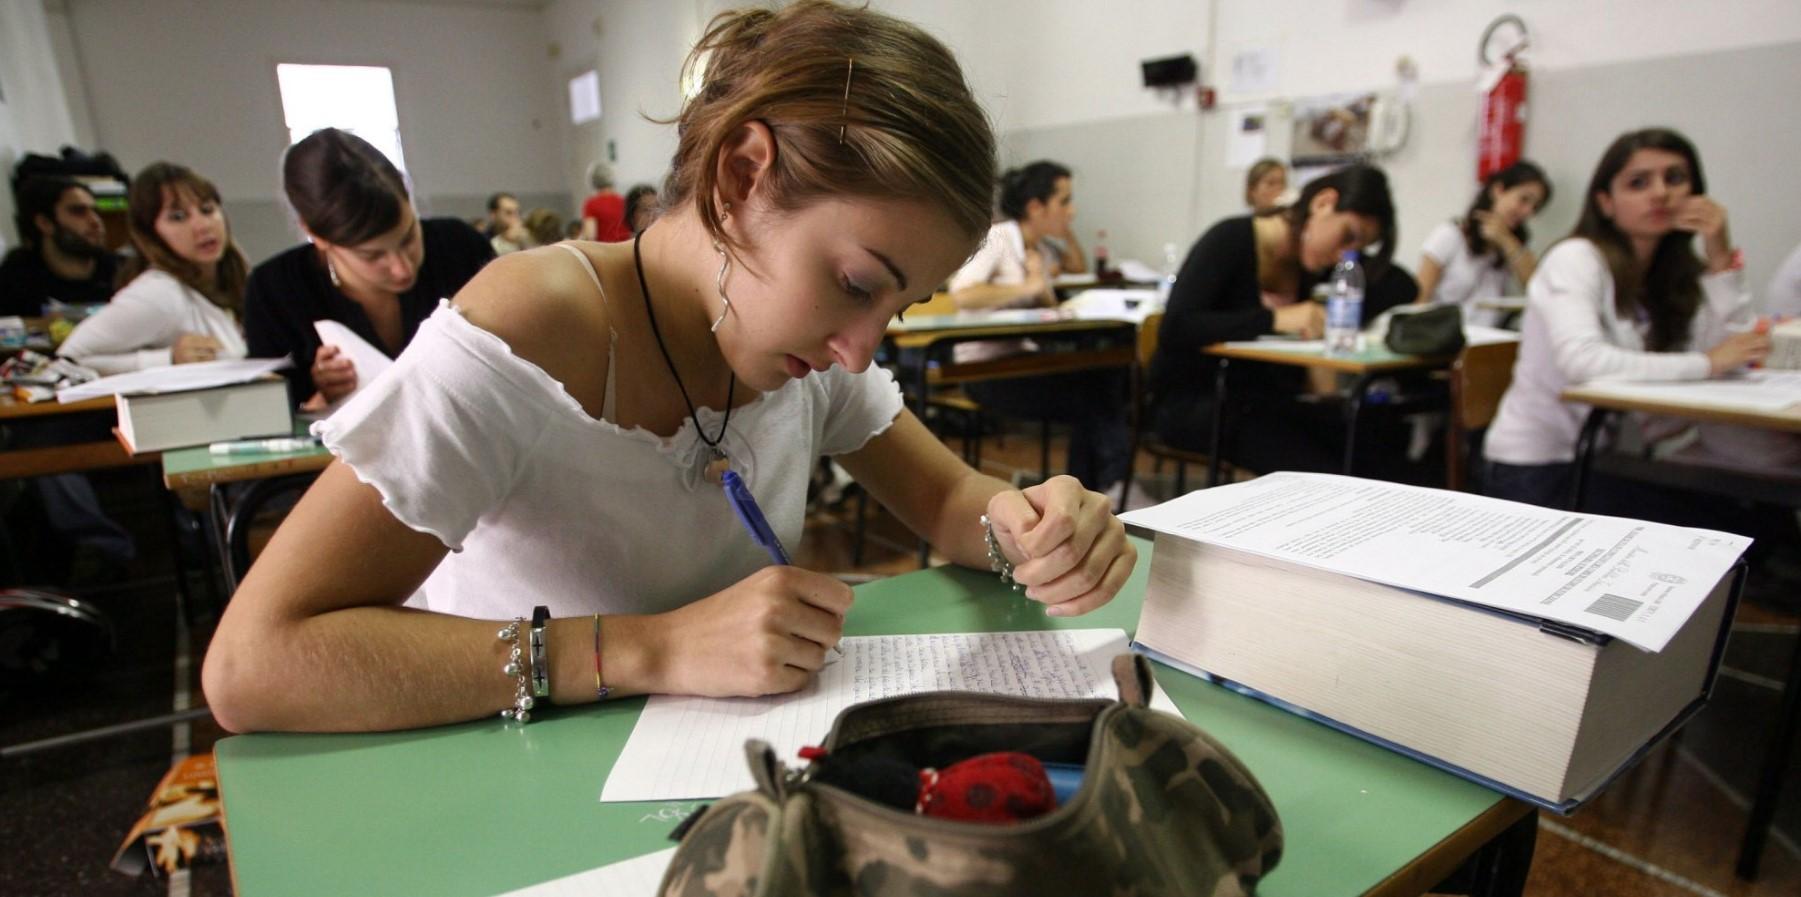 scuola-esame-maturita-studenti-studentessa